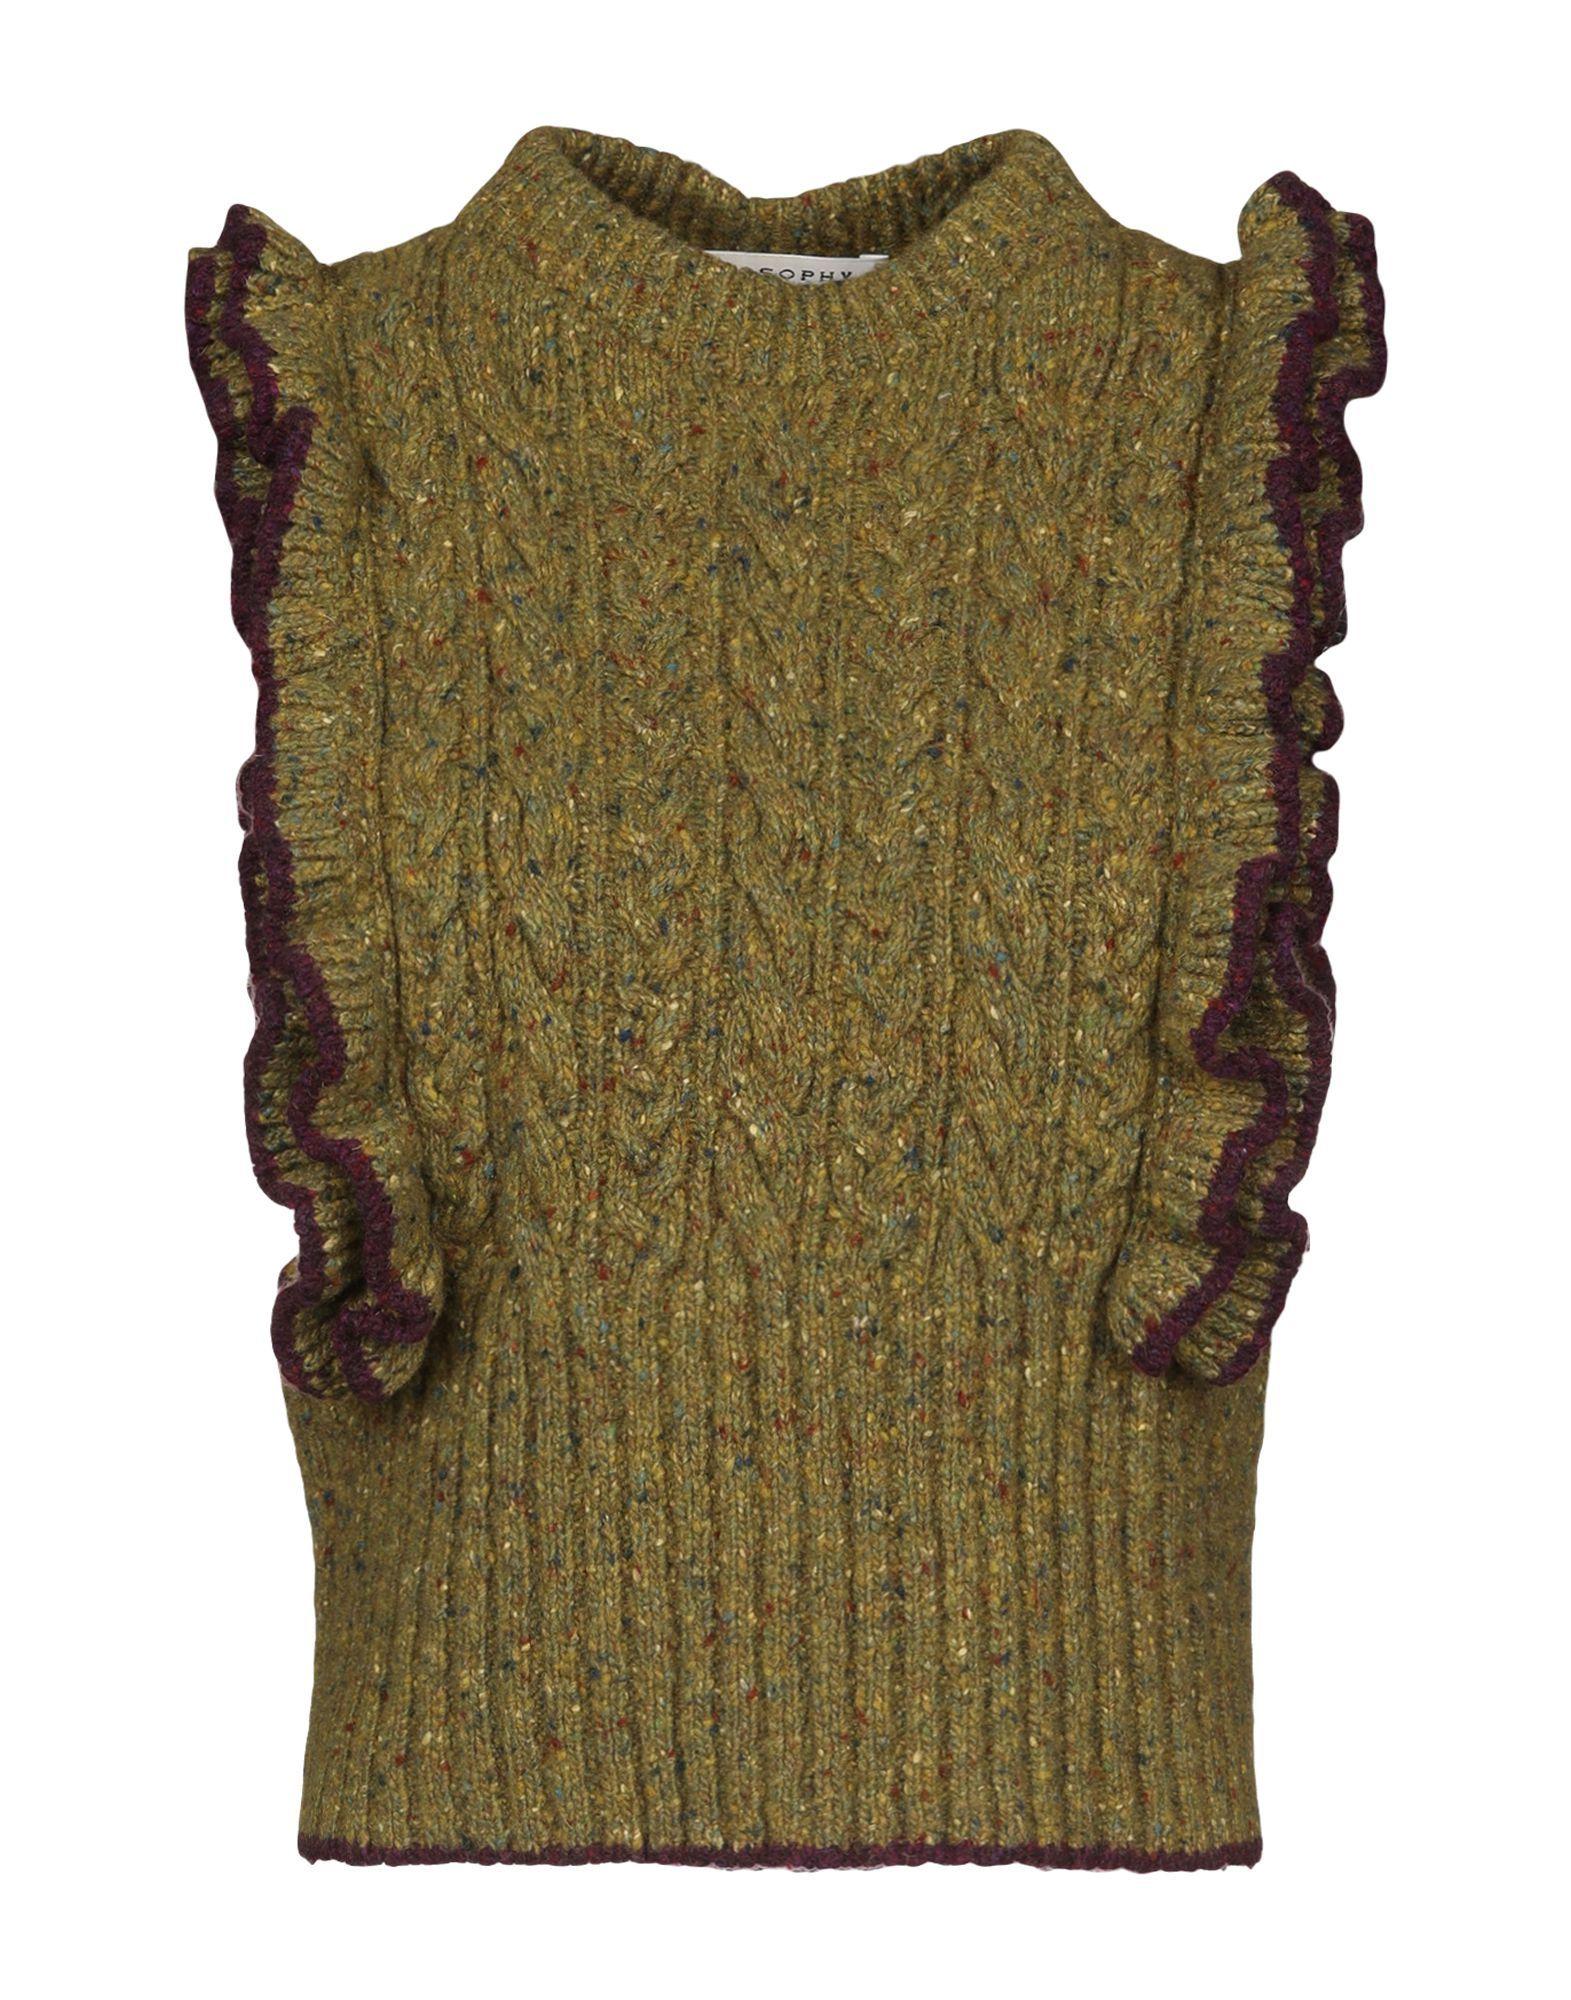 Topwear Alberta Ferretti Military Green Women's Wool